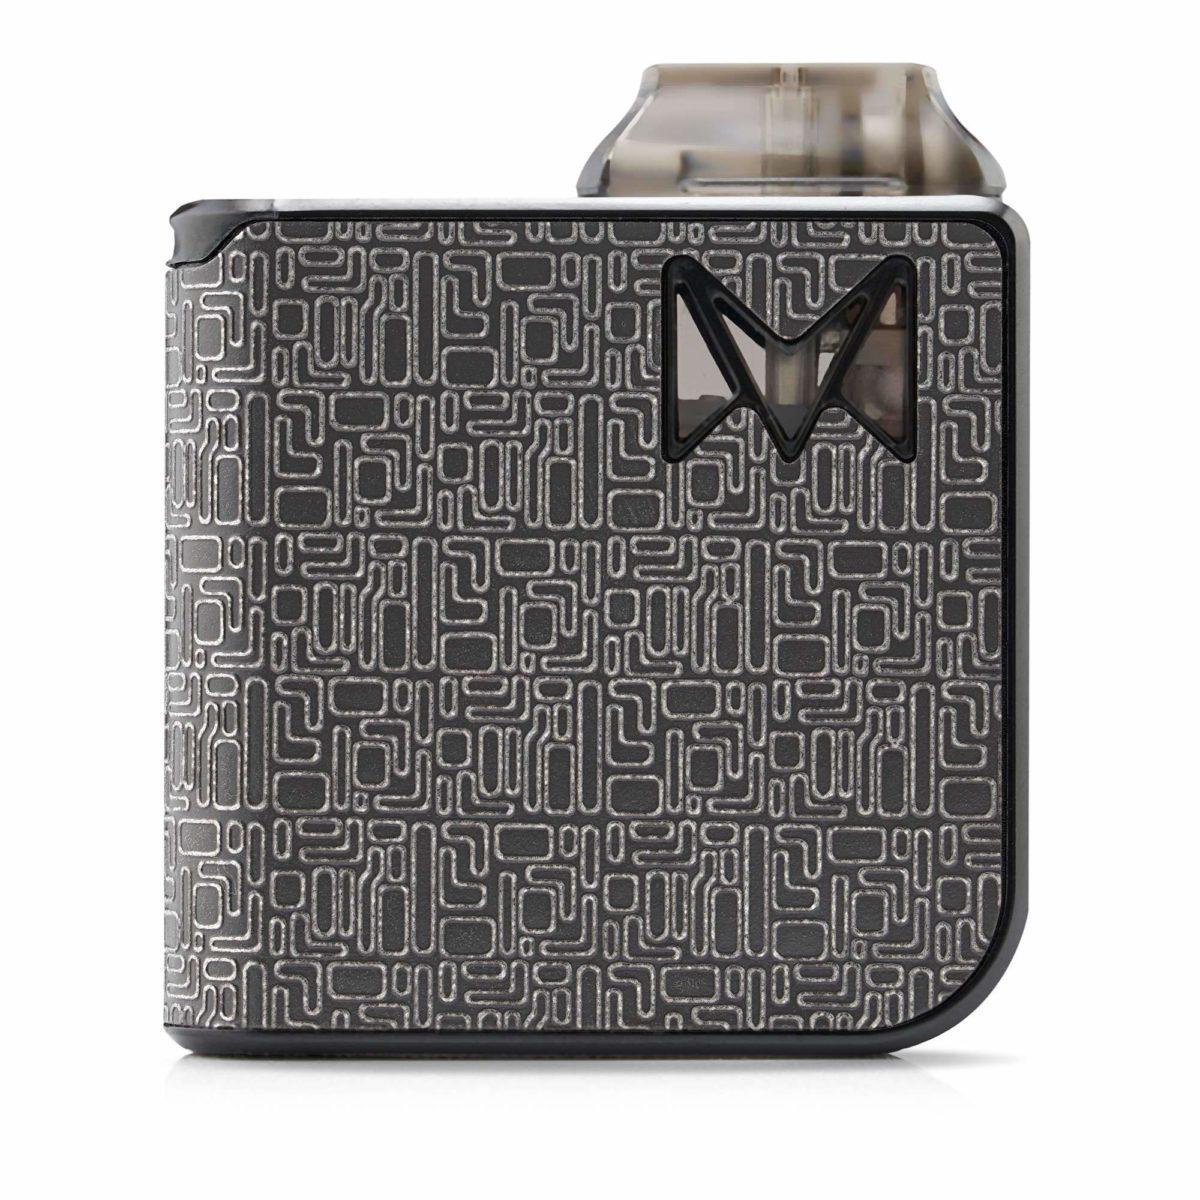 Mi-pod Ultra Portable Starter Kit by Smoking Vapor Review